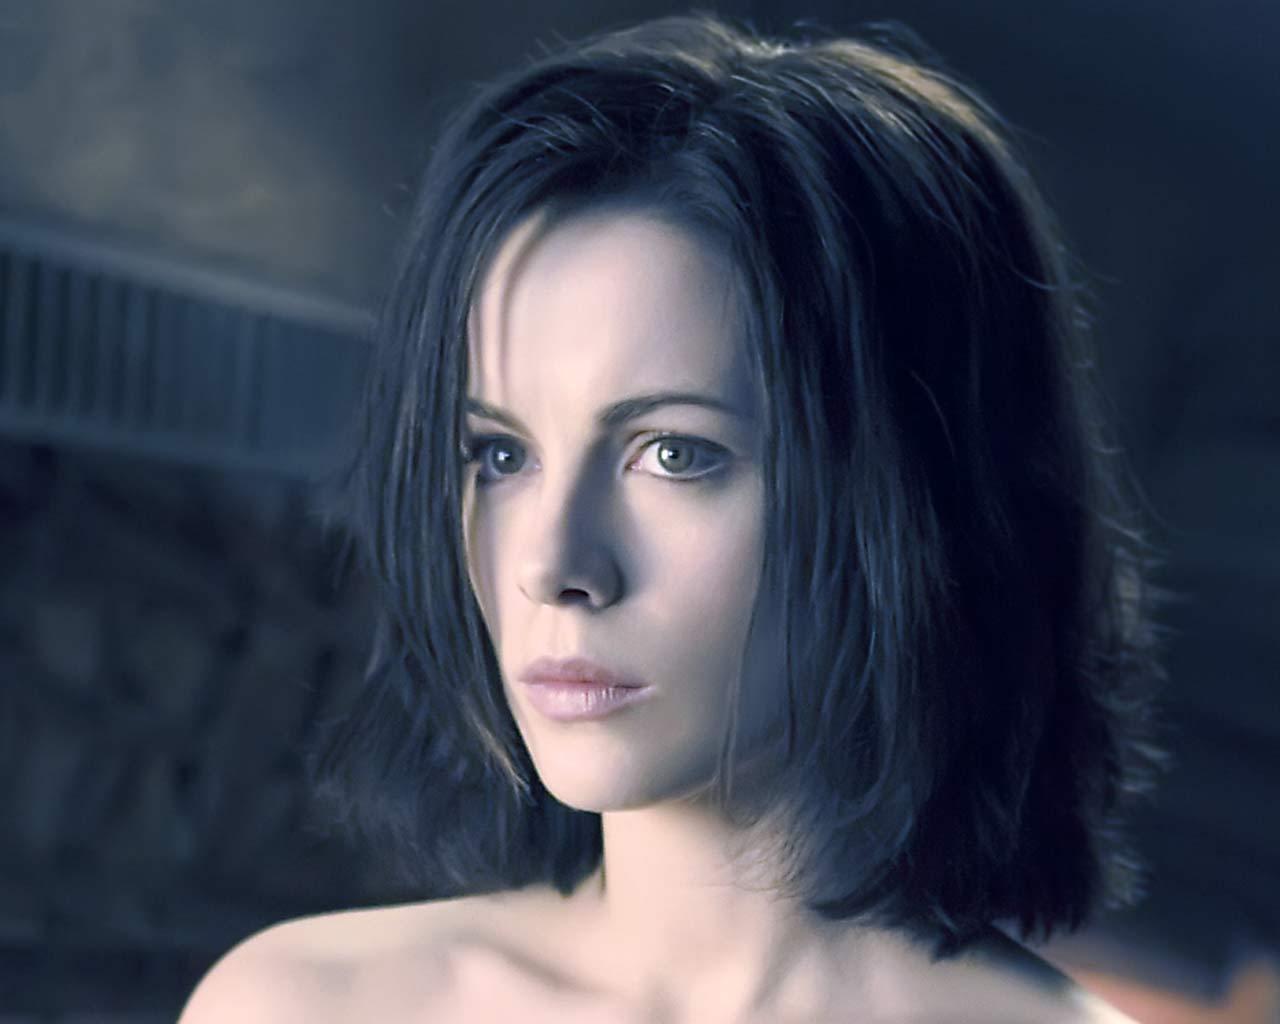 Kate Beckinsale Underworld Hot